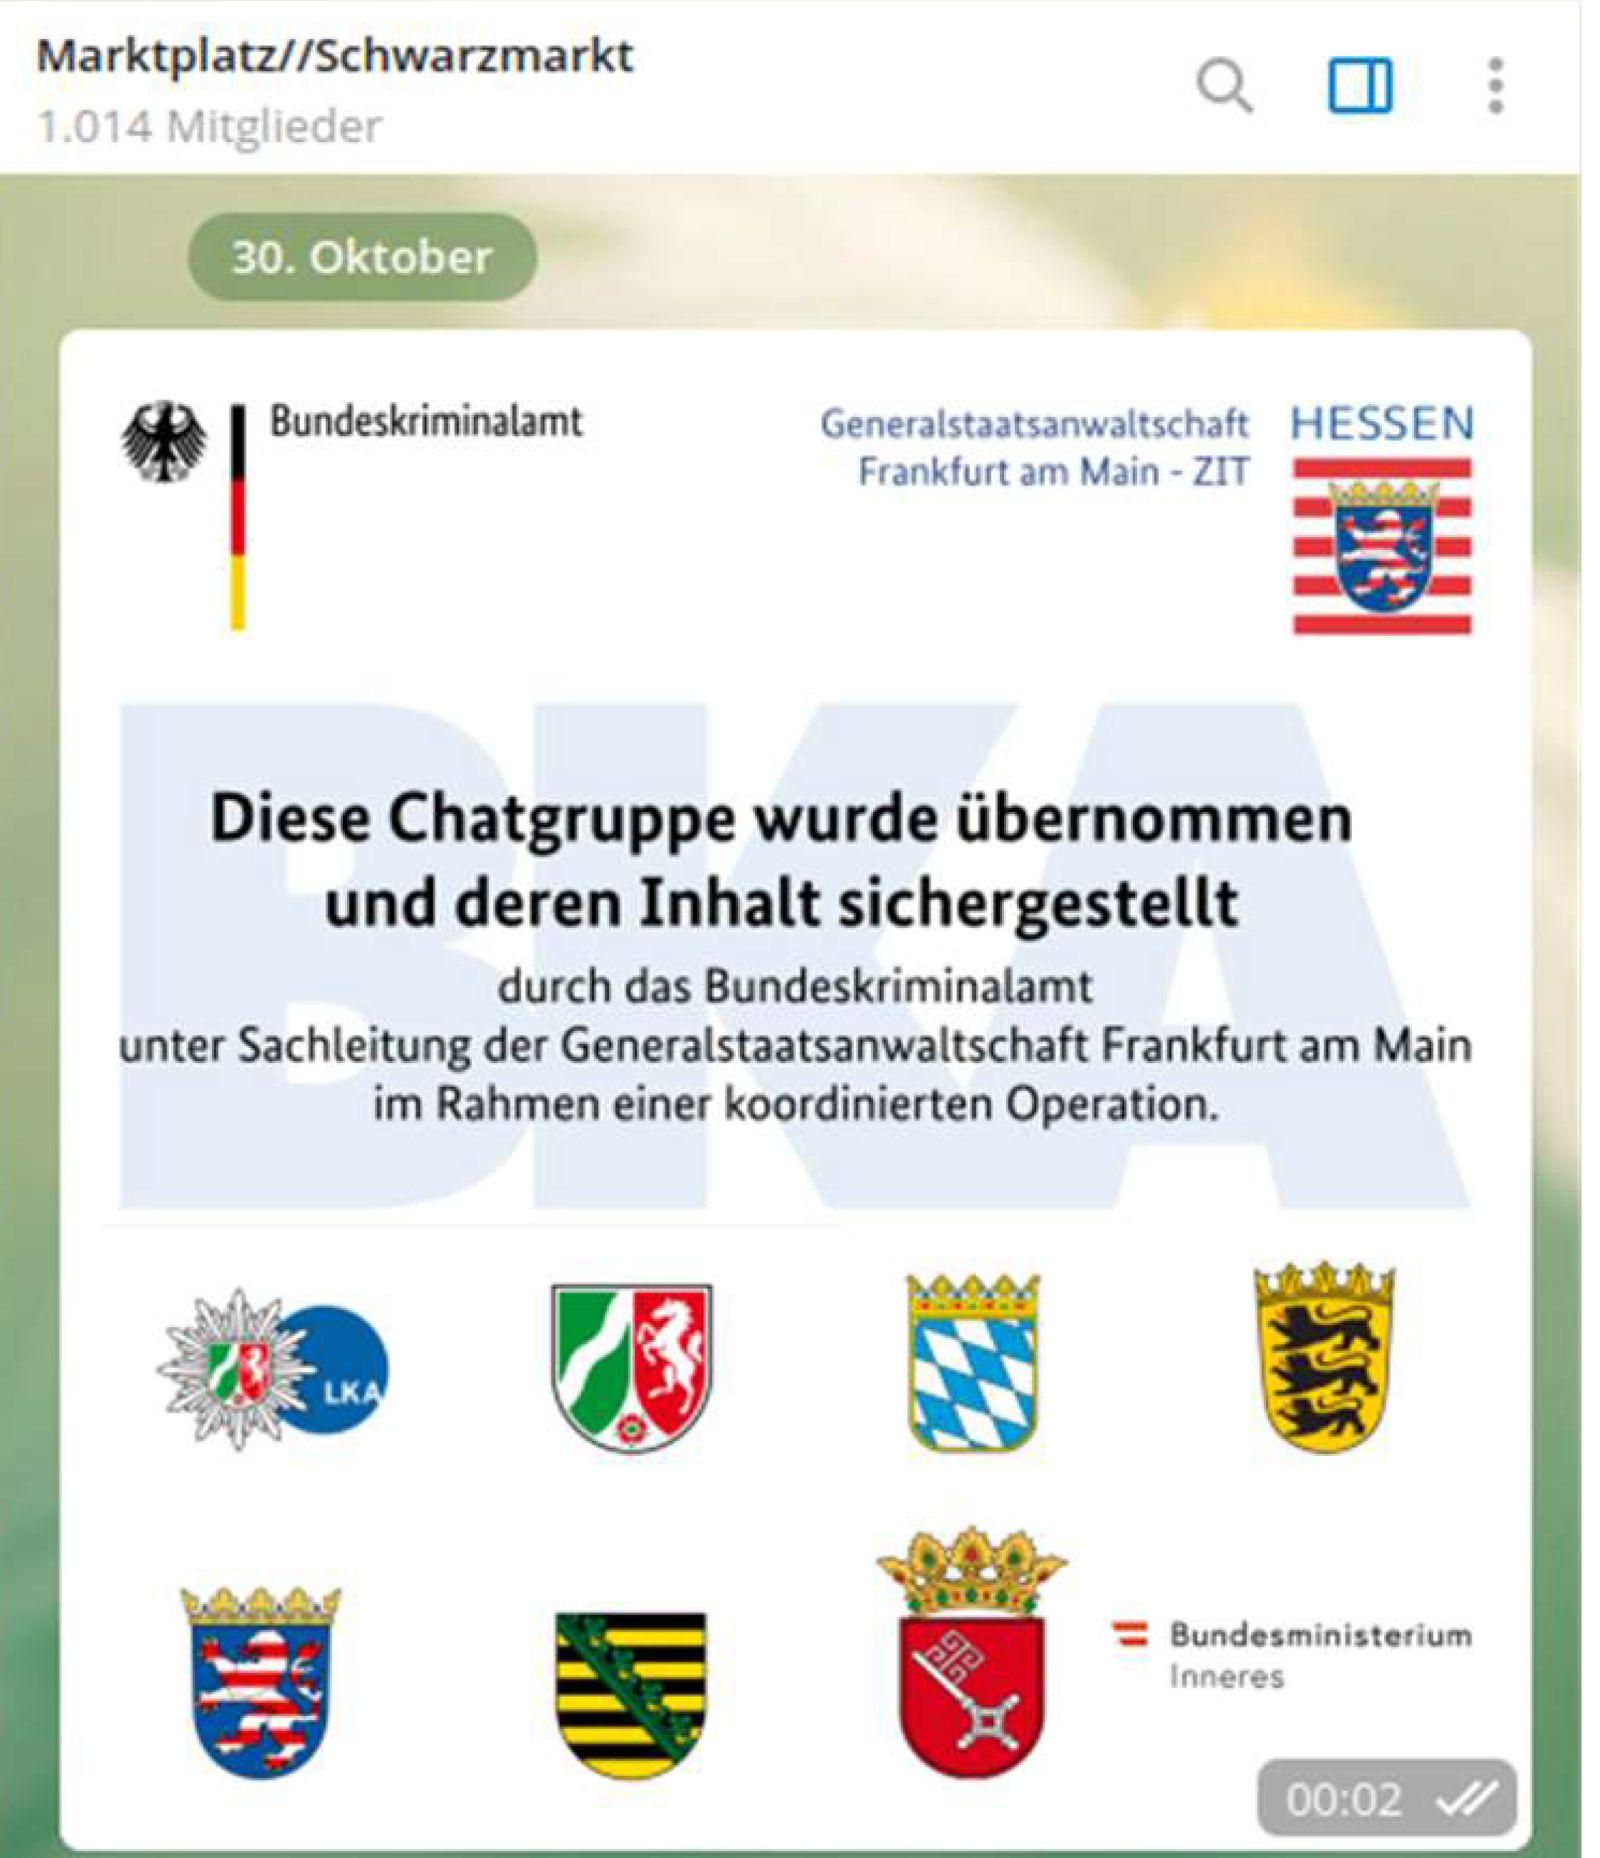 Microsoft Word - EV_Brieftaube_PM.docx